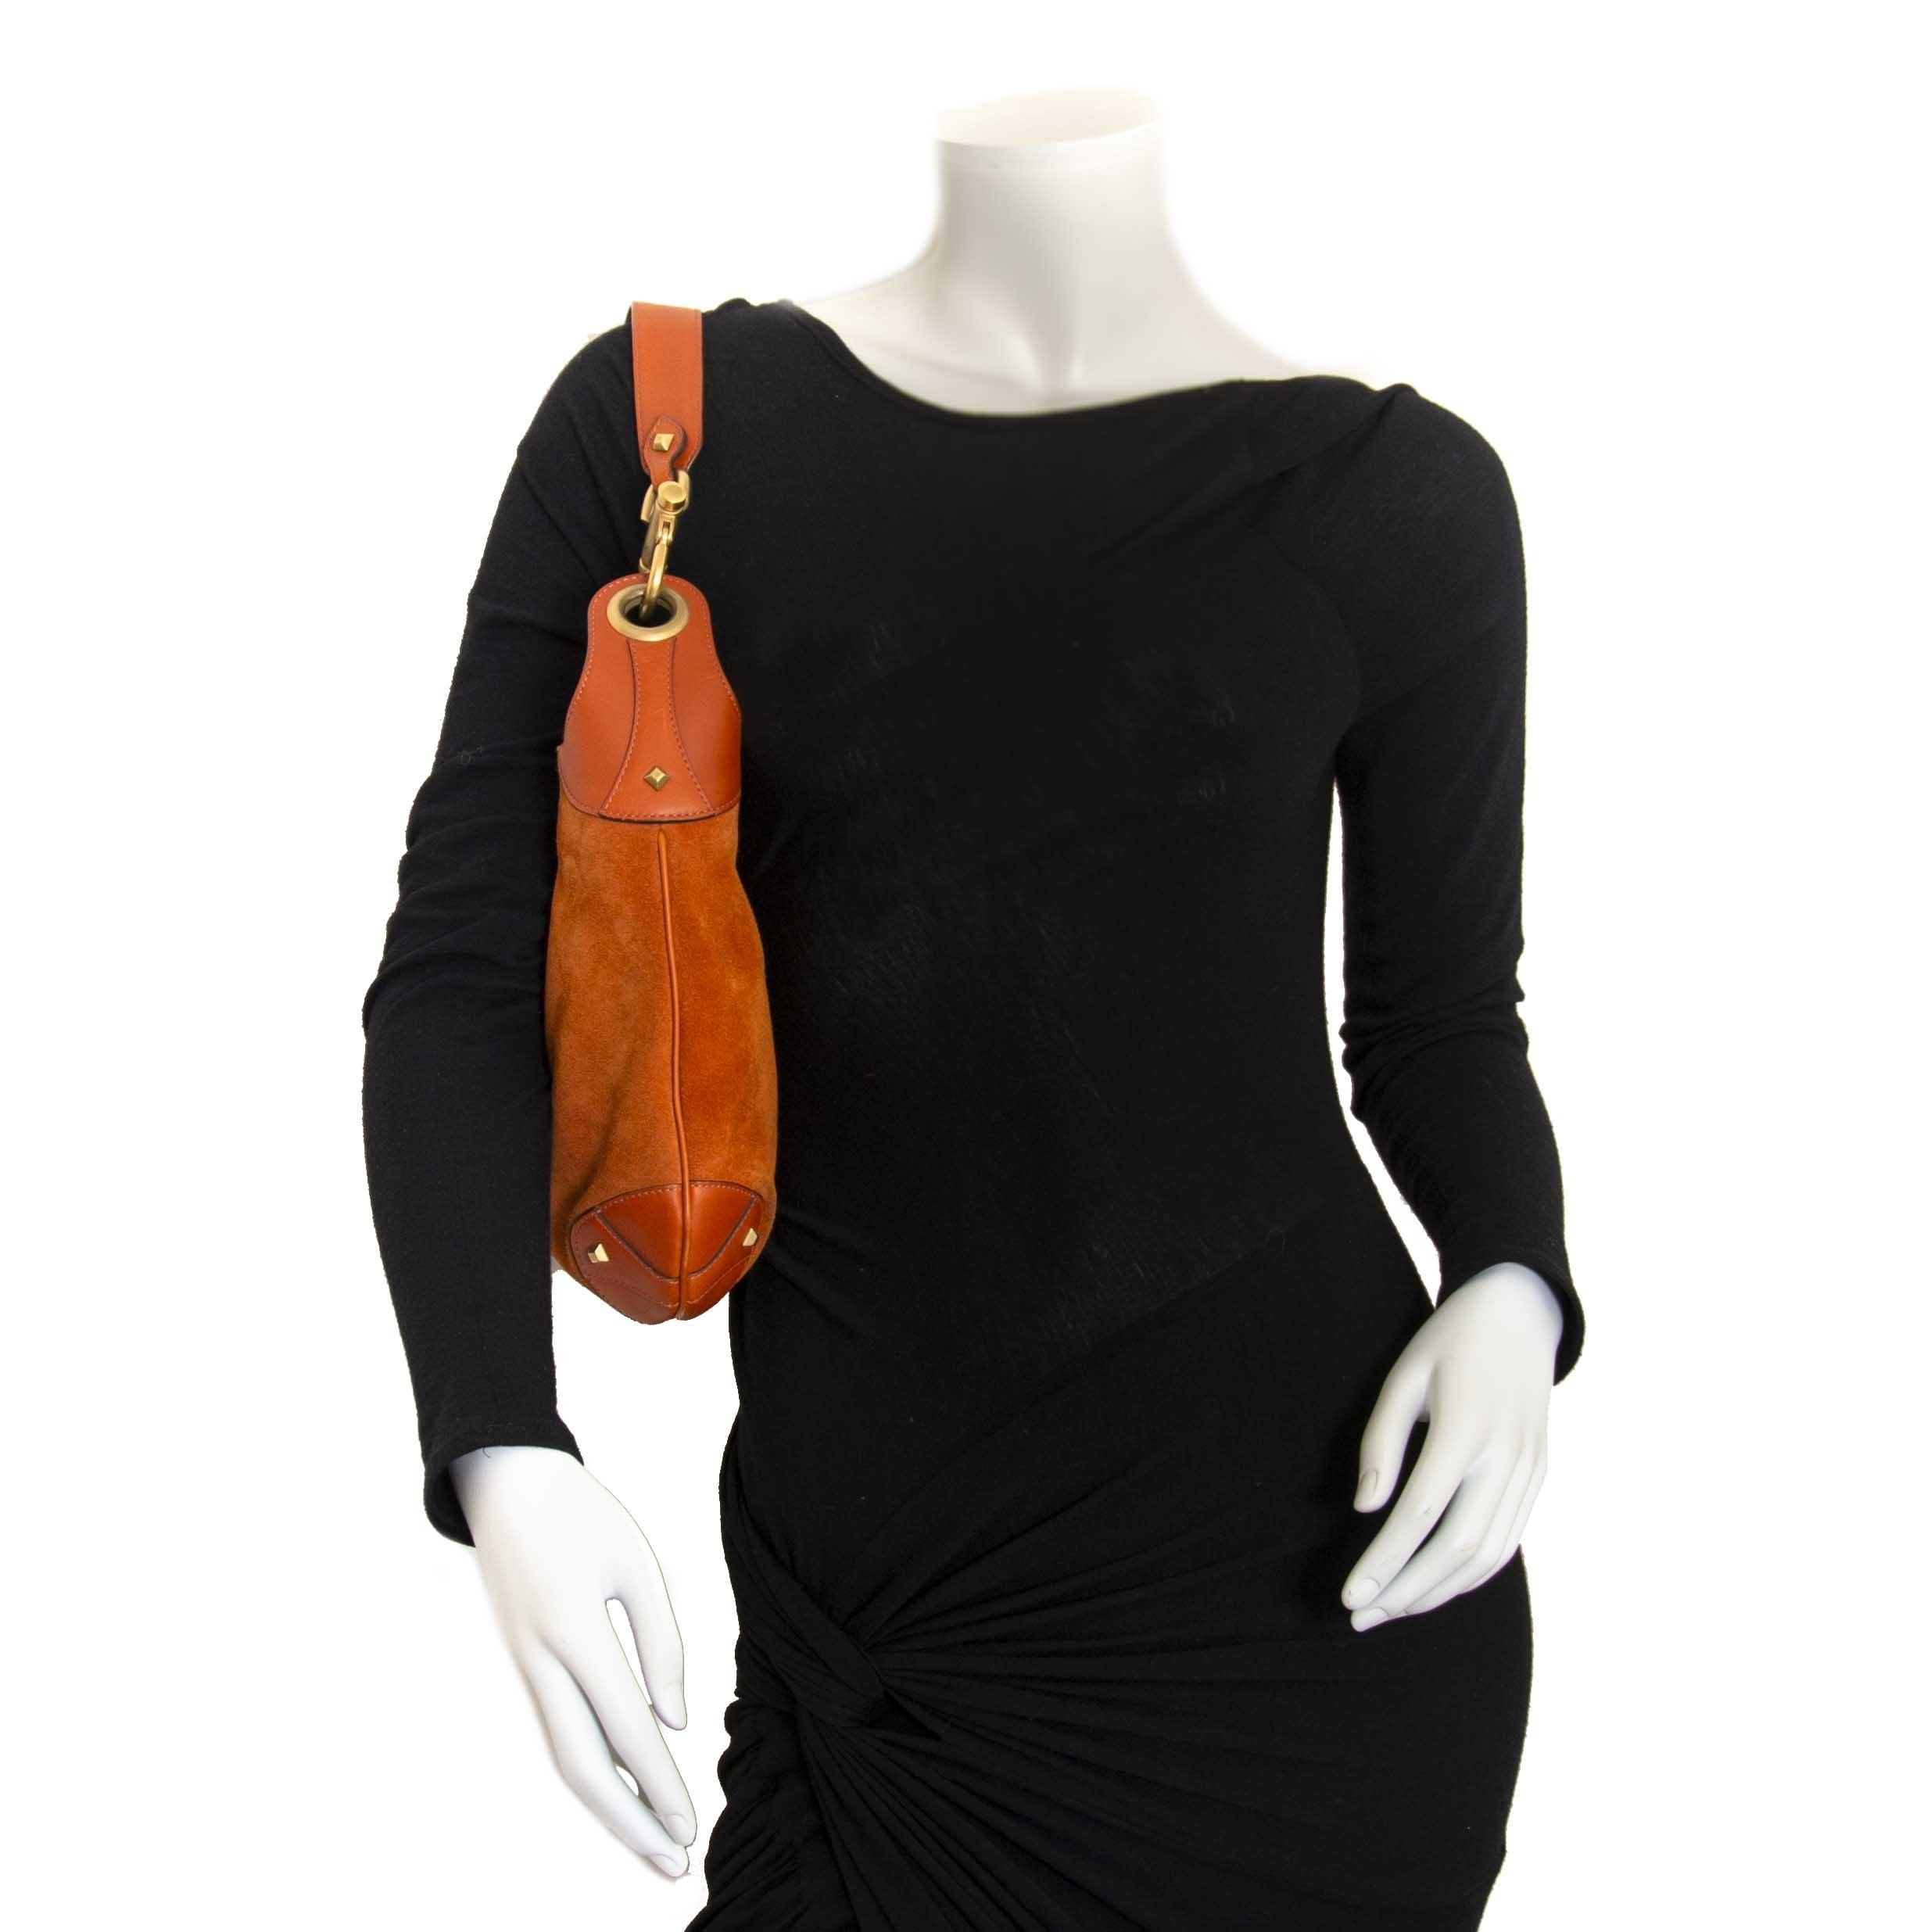 Gucci Orange Suede Jackie Bag now for sale at labellov vintage fashion webshop belgium